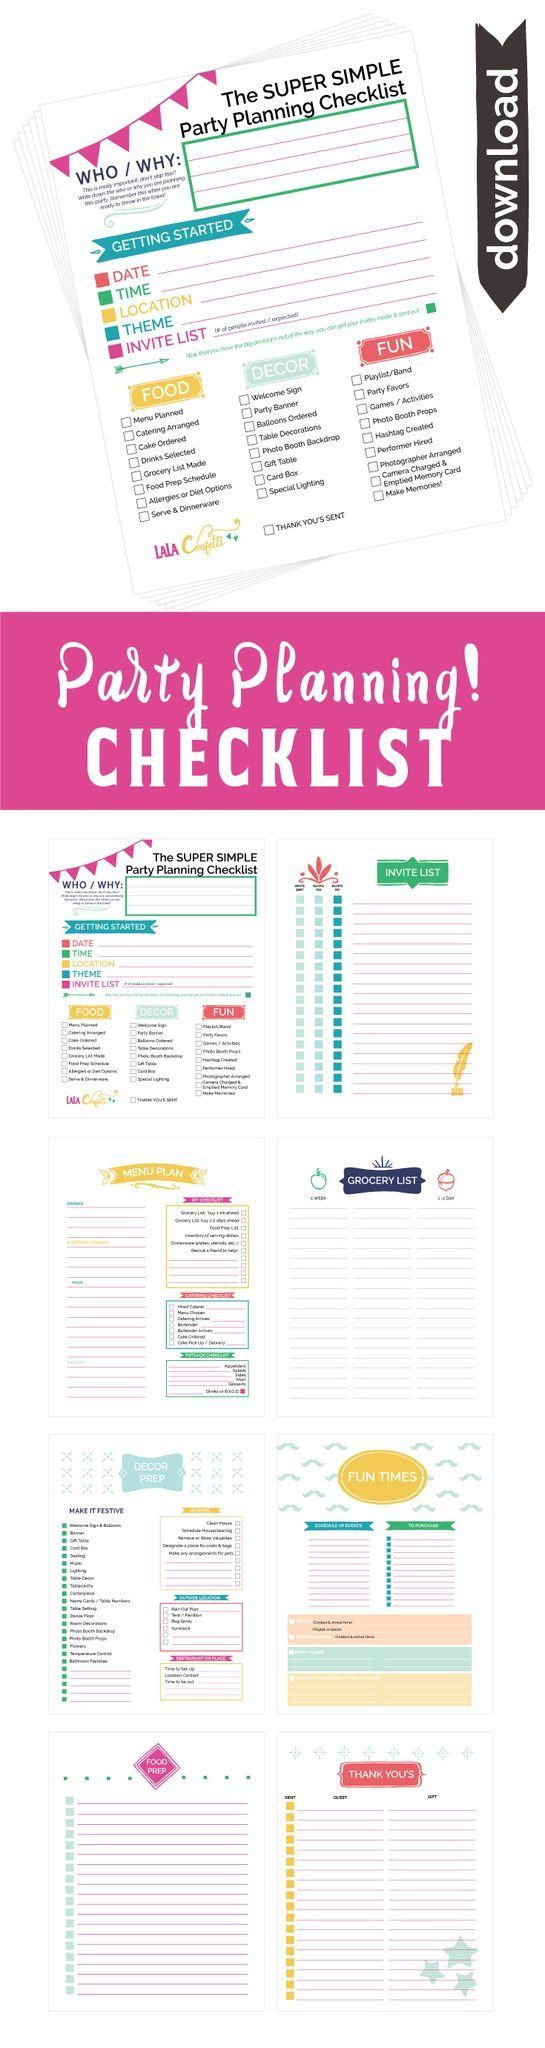 Party Planning Checklist  Party Planning Checklist Checklist